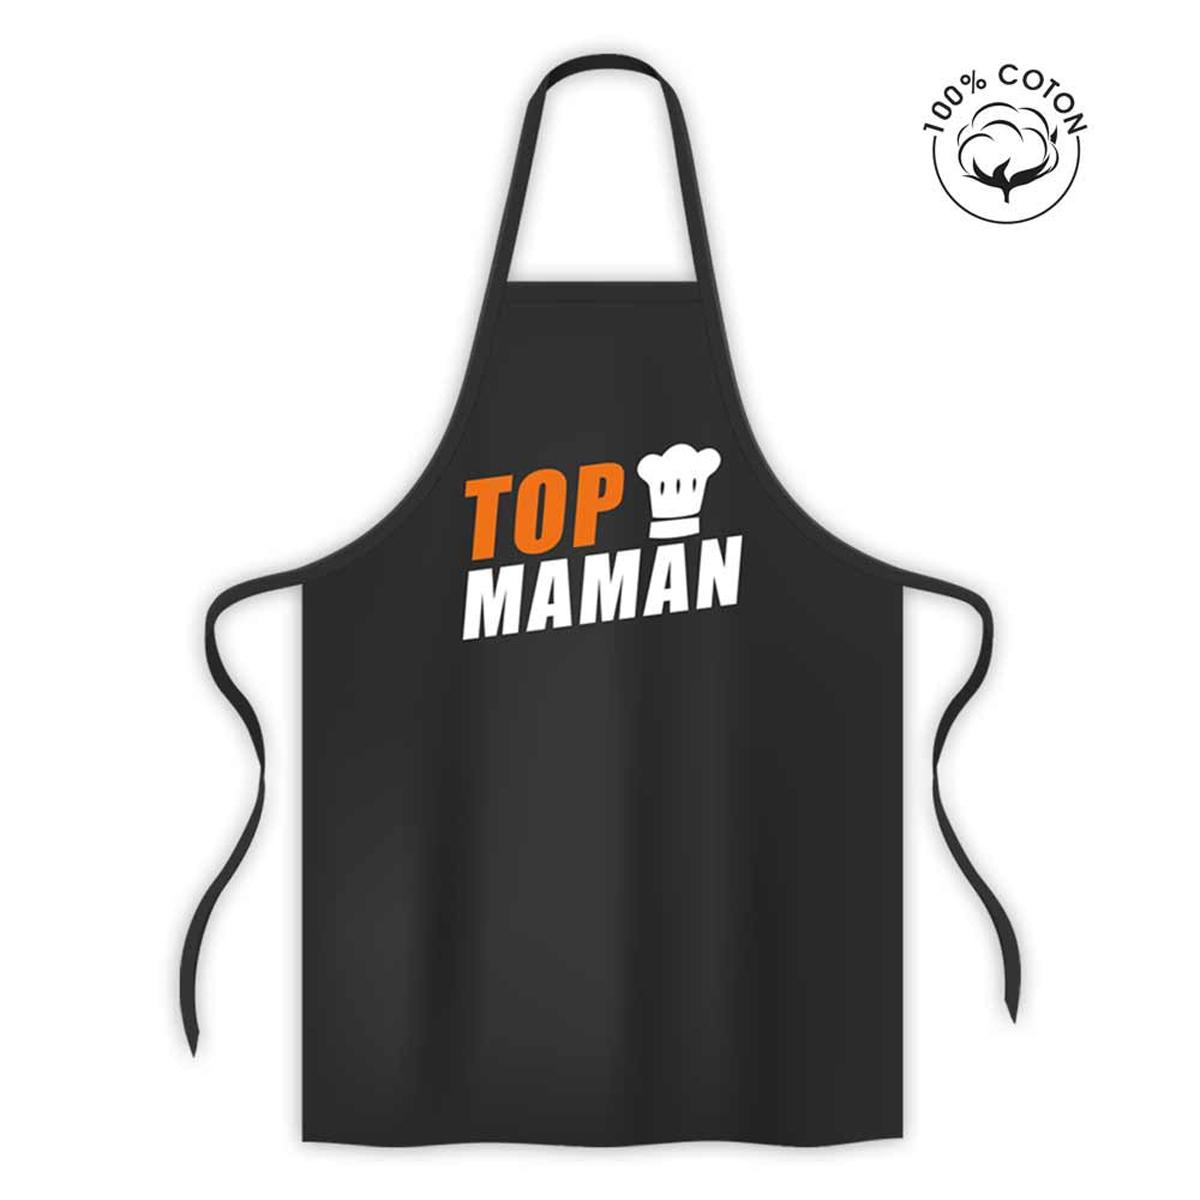 Tablier coton \'Top Chef Maman\' noir - 80x70 cm - [R1582]